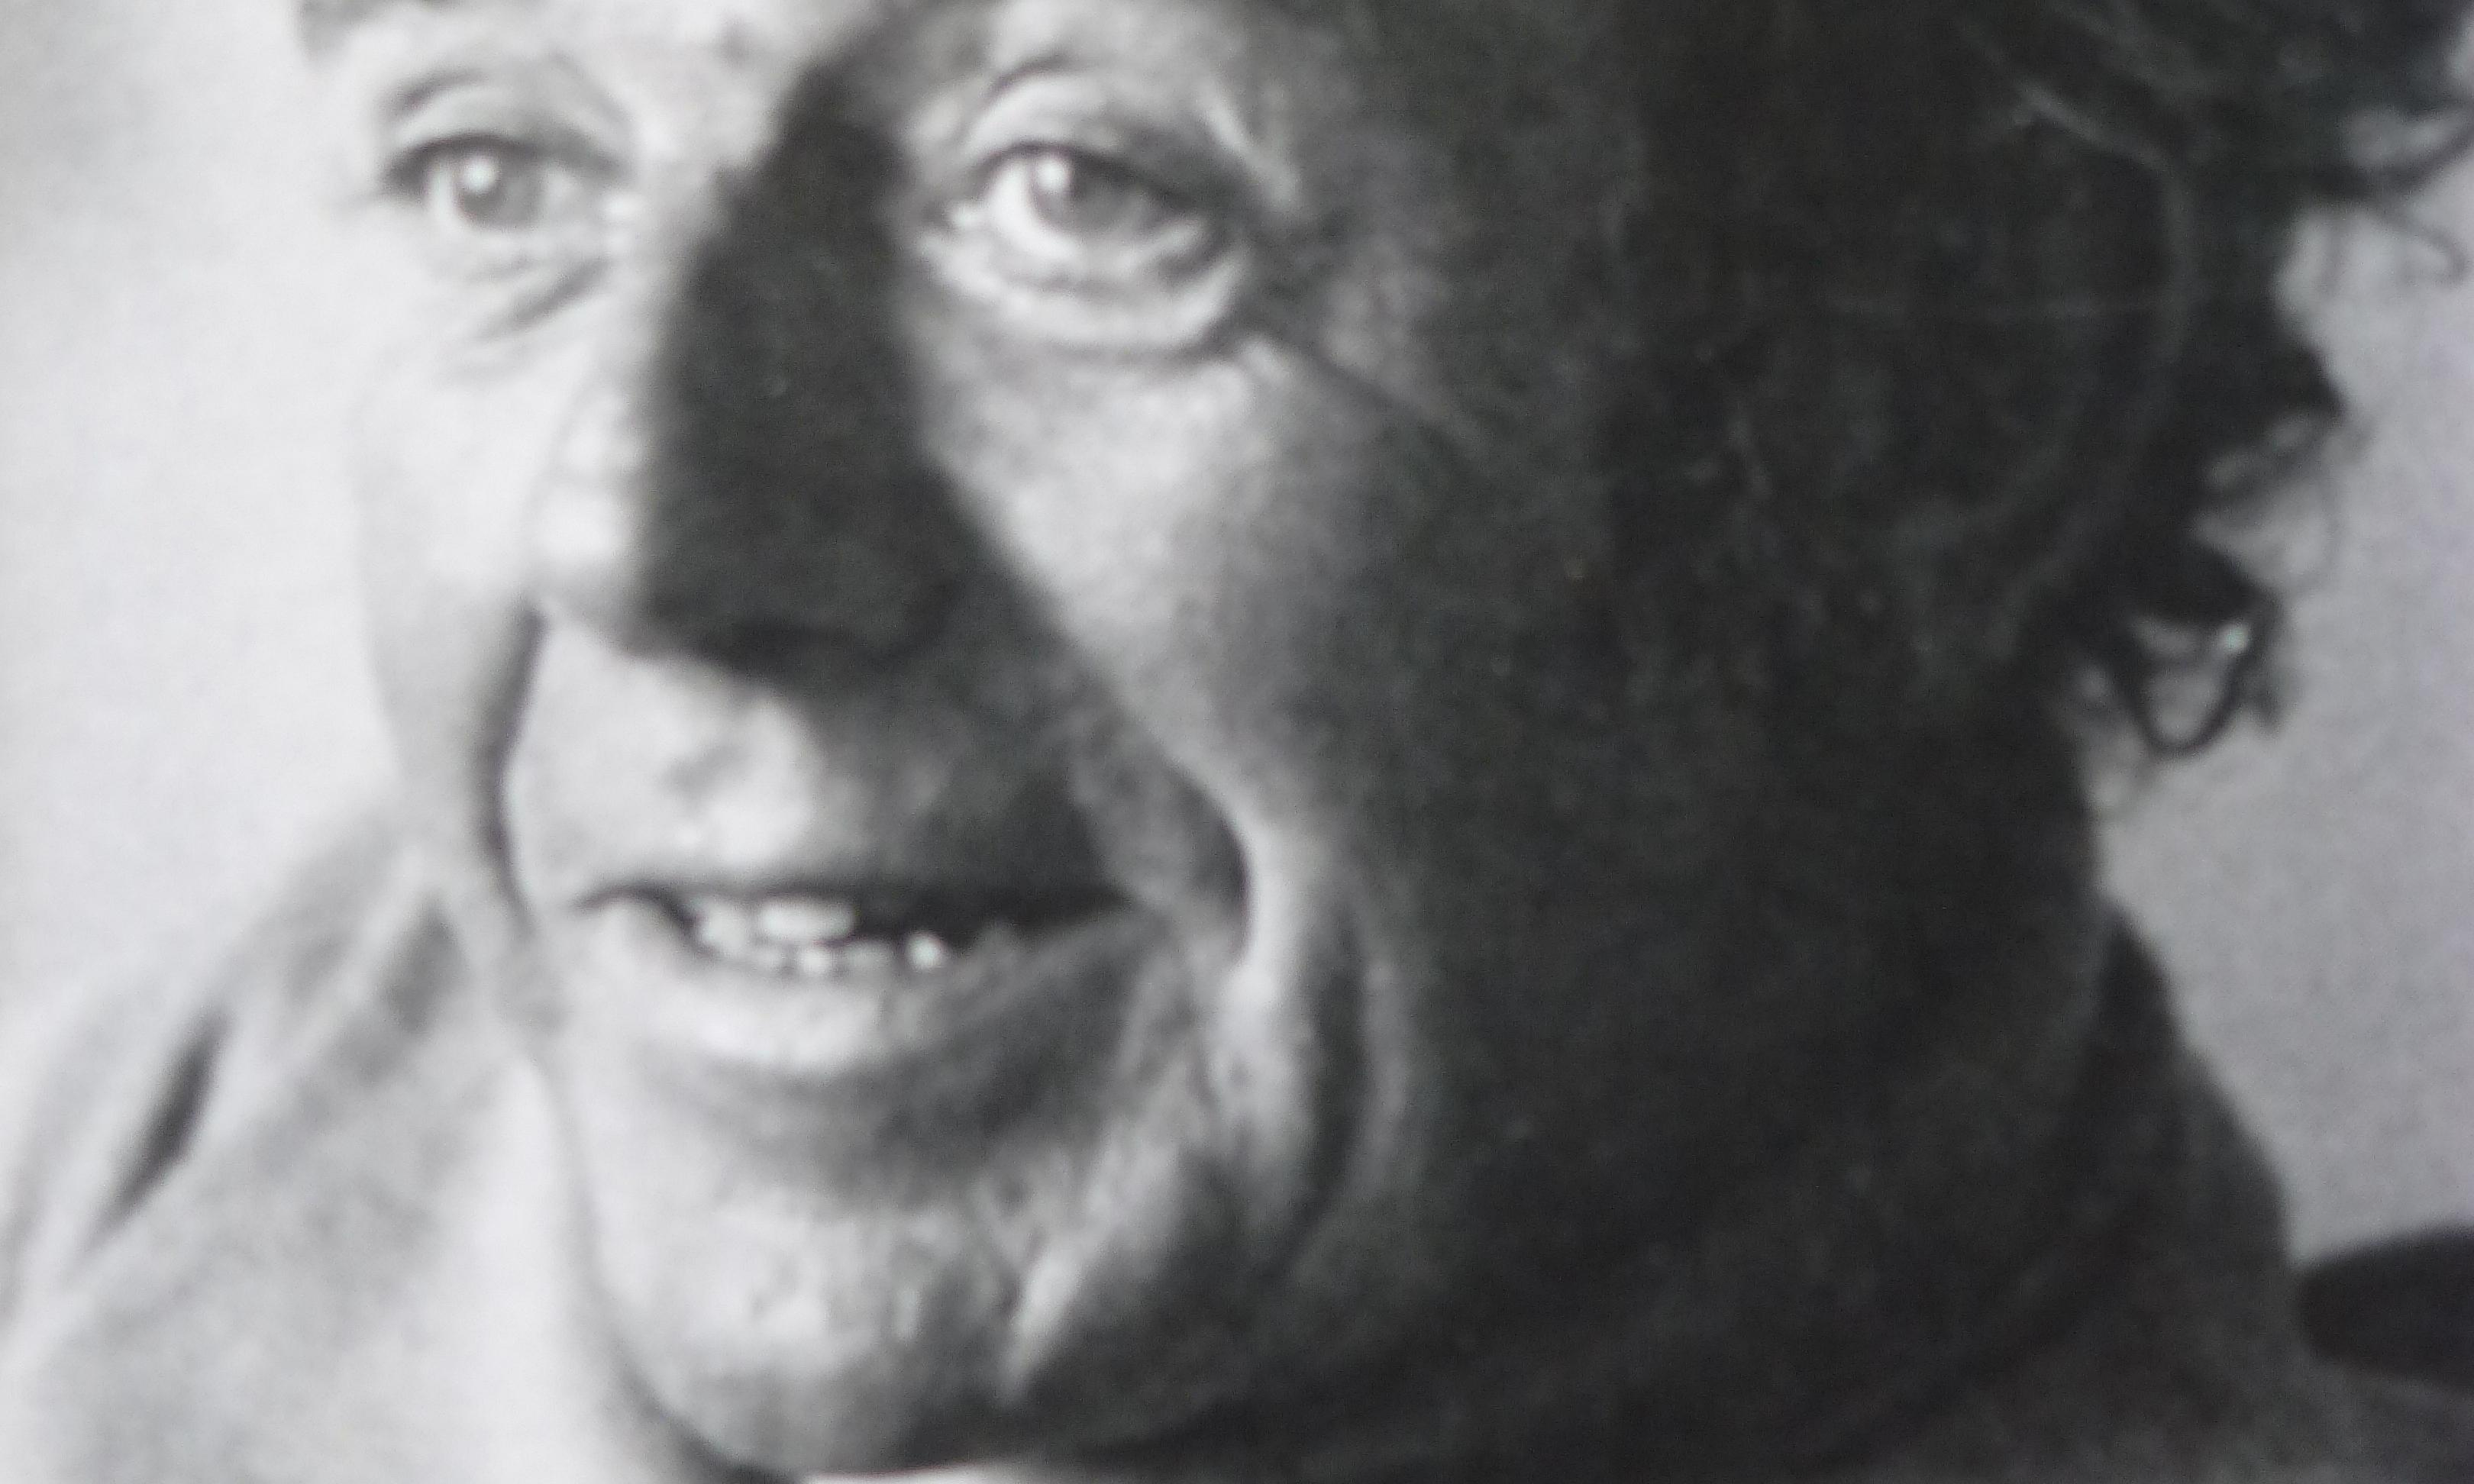 Brian Sissons obituary